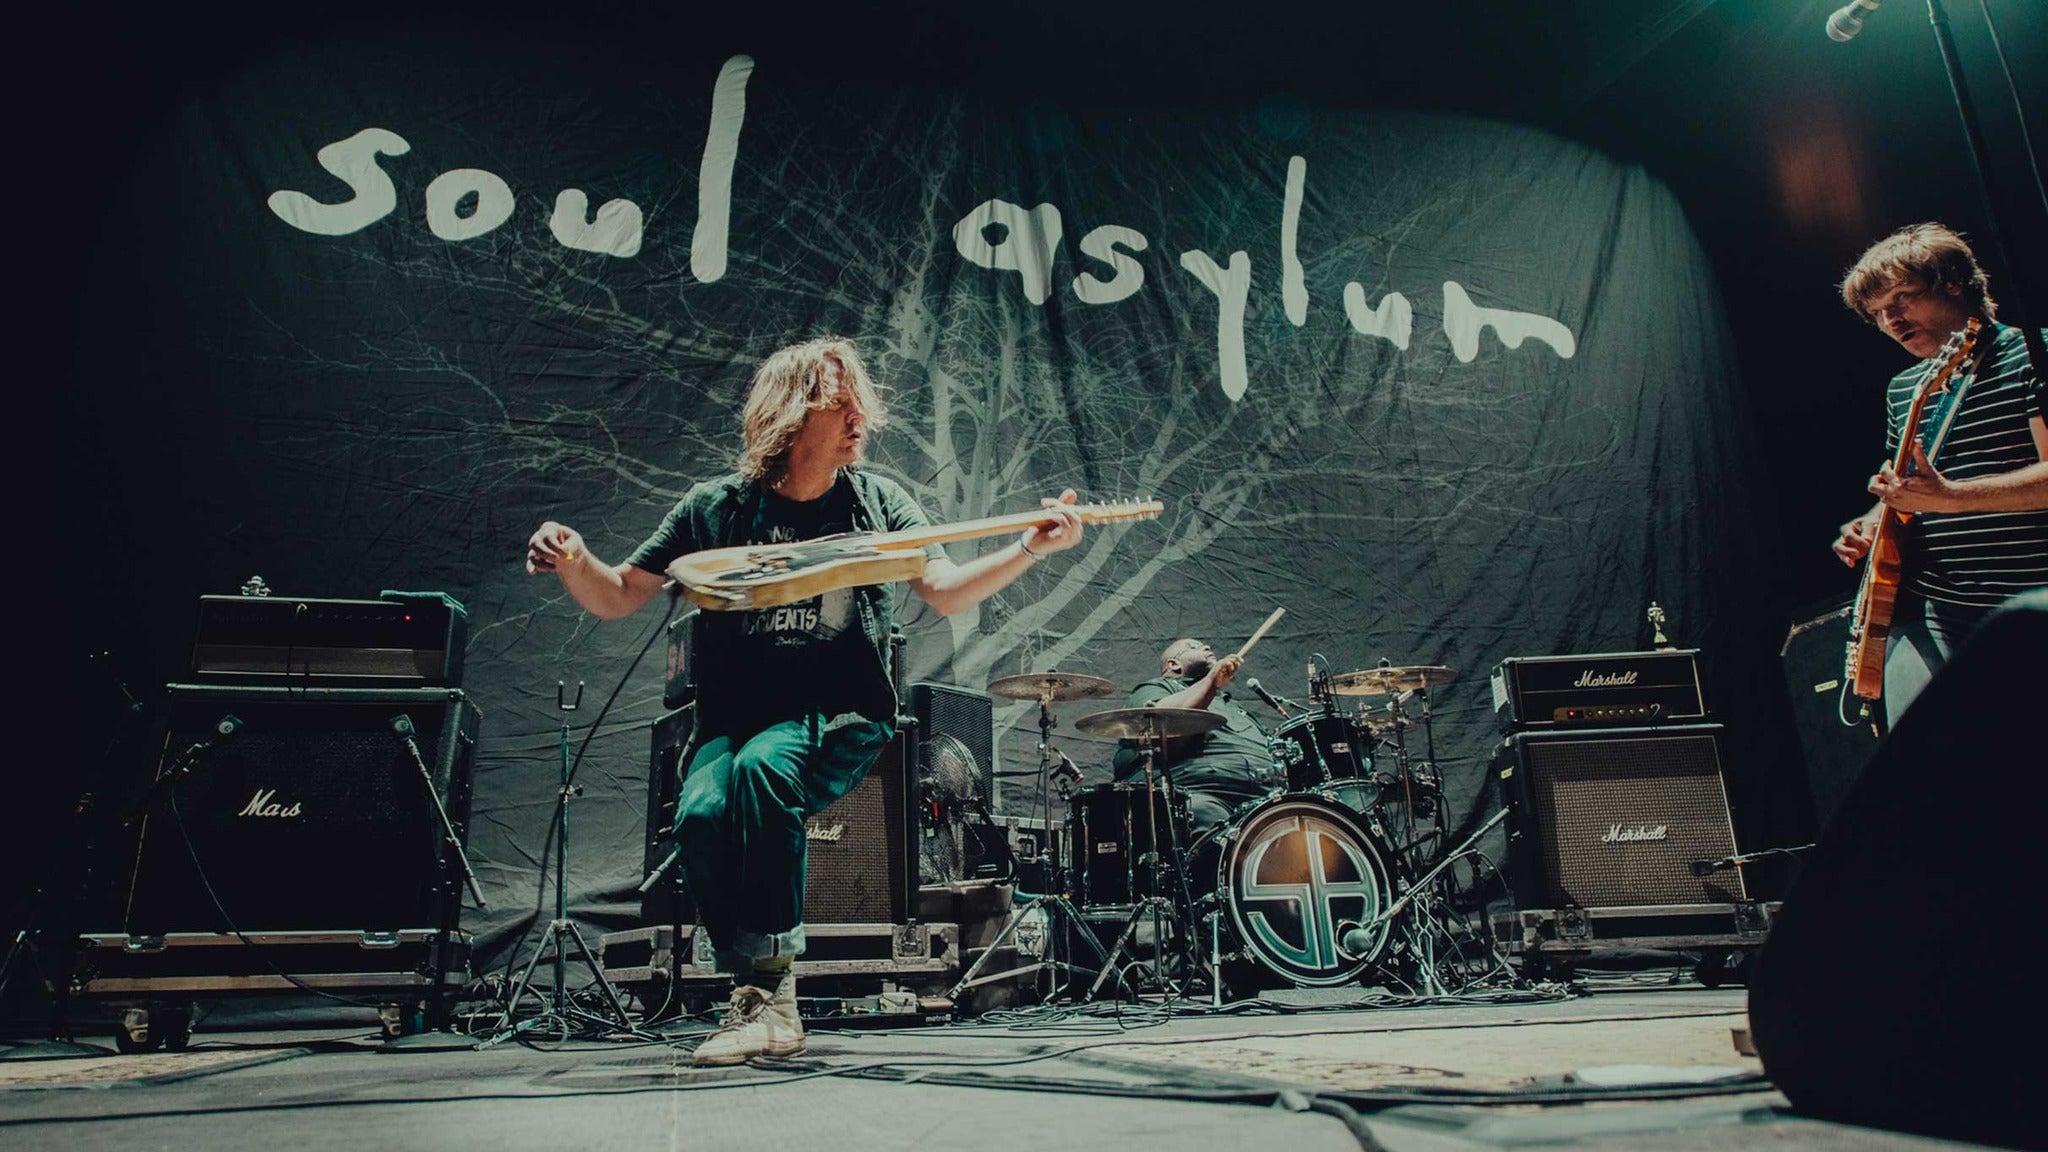 Soul Asylum pre-sale password for event tickets in Huntsville, AL (Mars Music Hall)